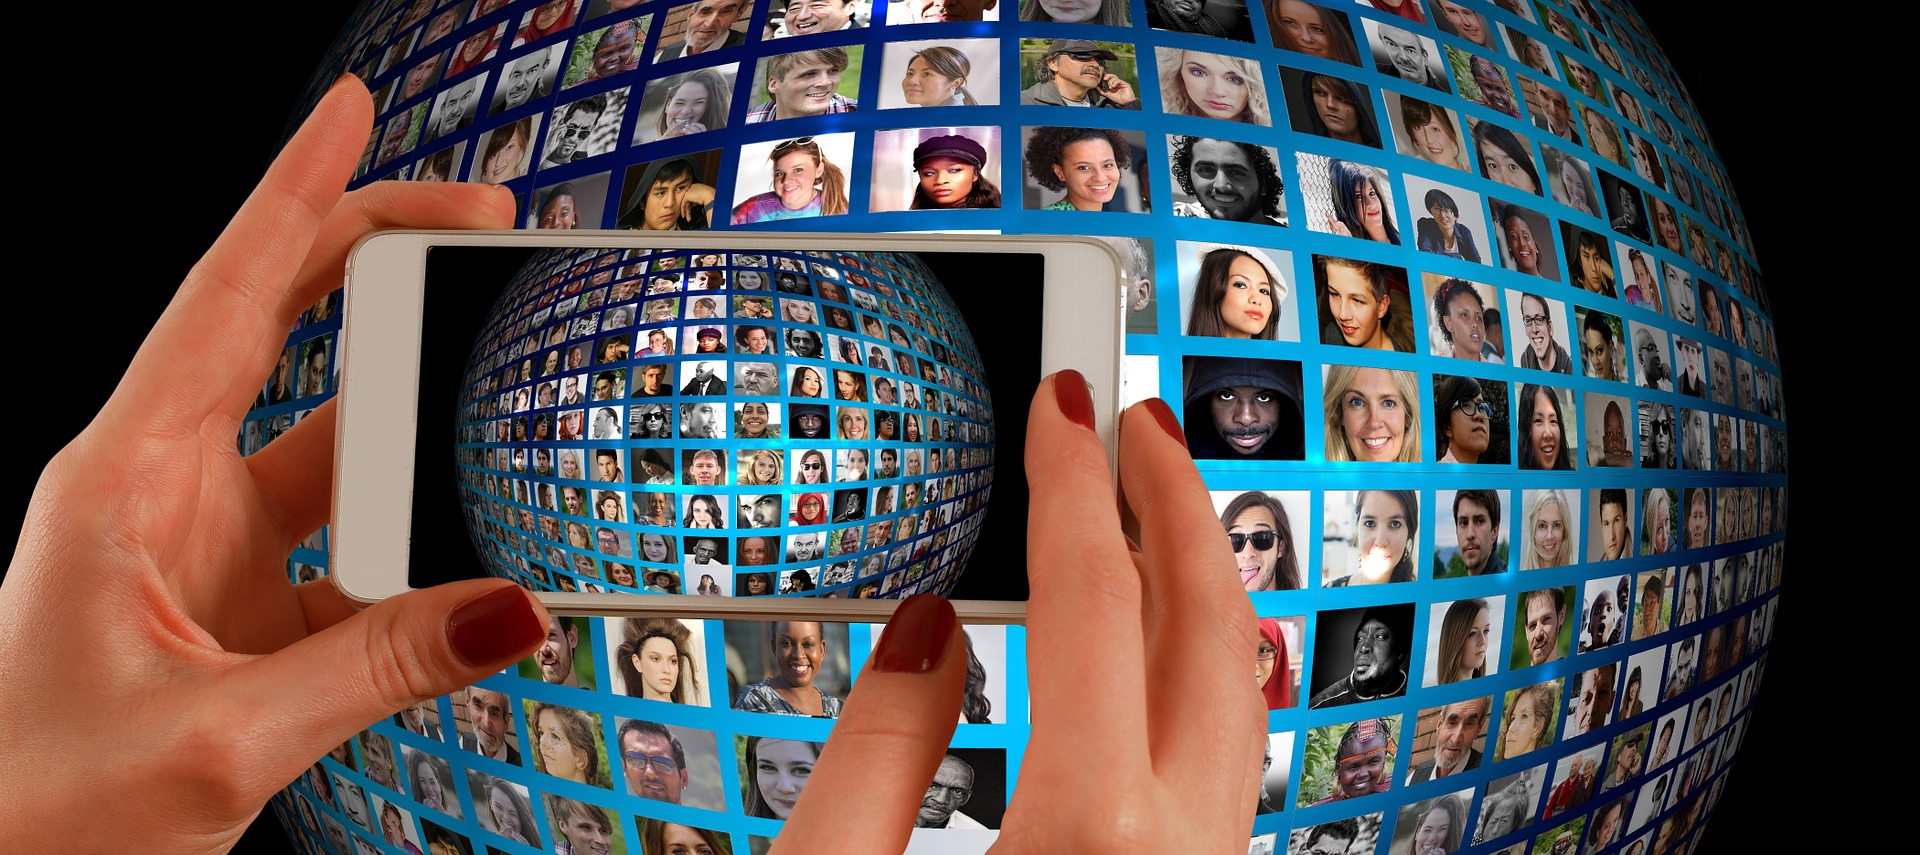 Profil pracodawcy w social mediach